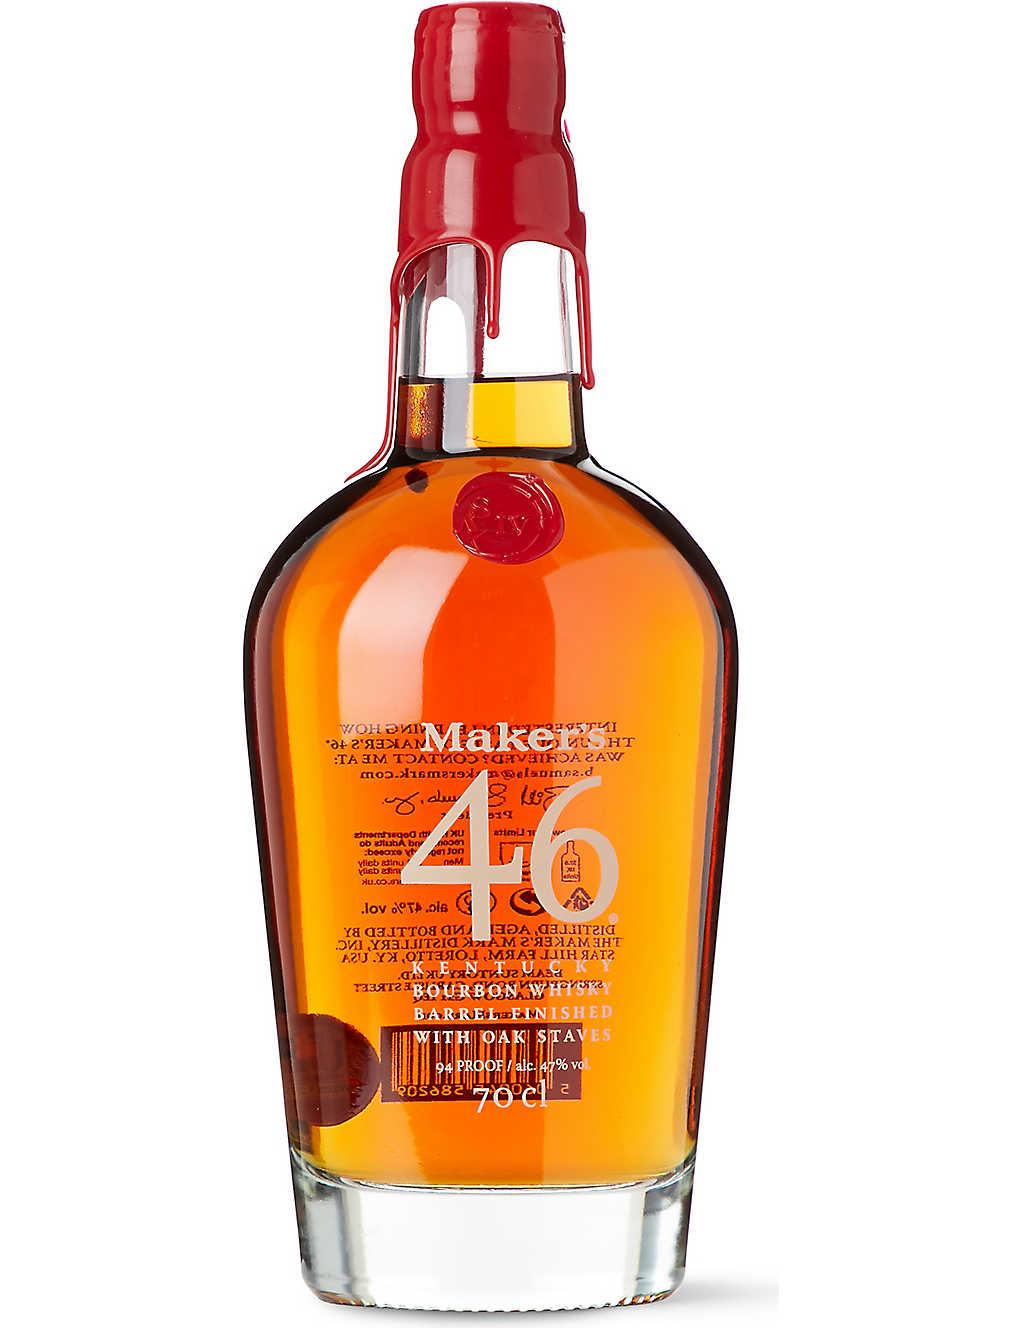 Maker's Mark 46 Barrel Finished Kentucky Straight Bourbon Whisky